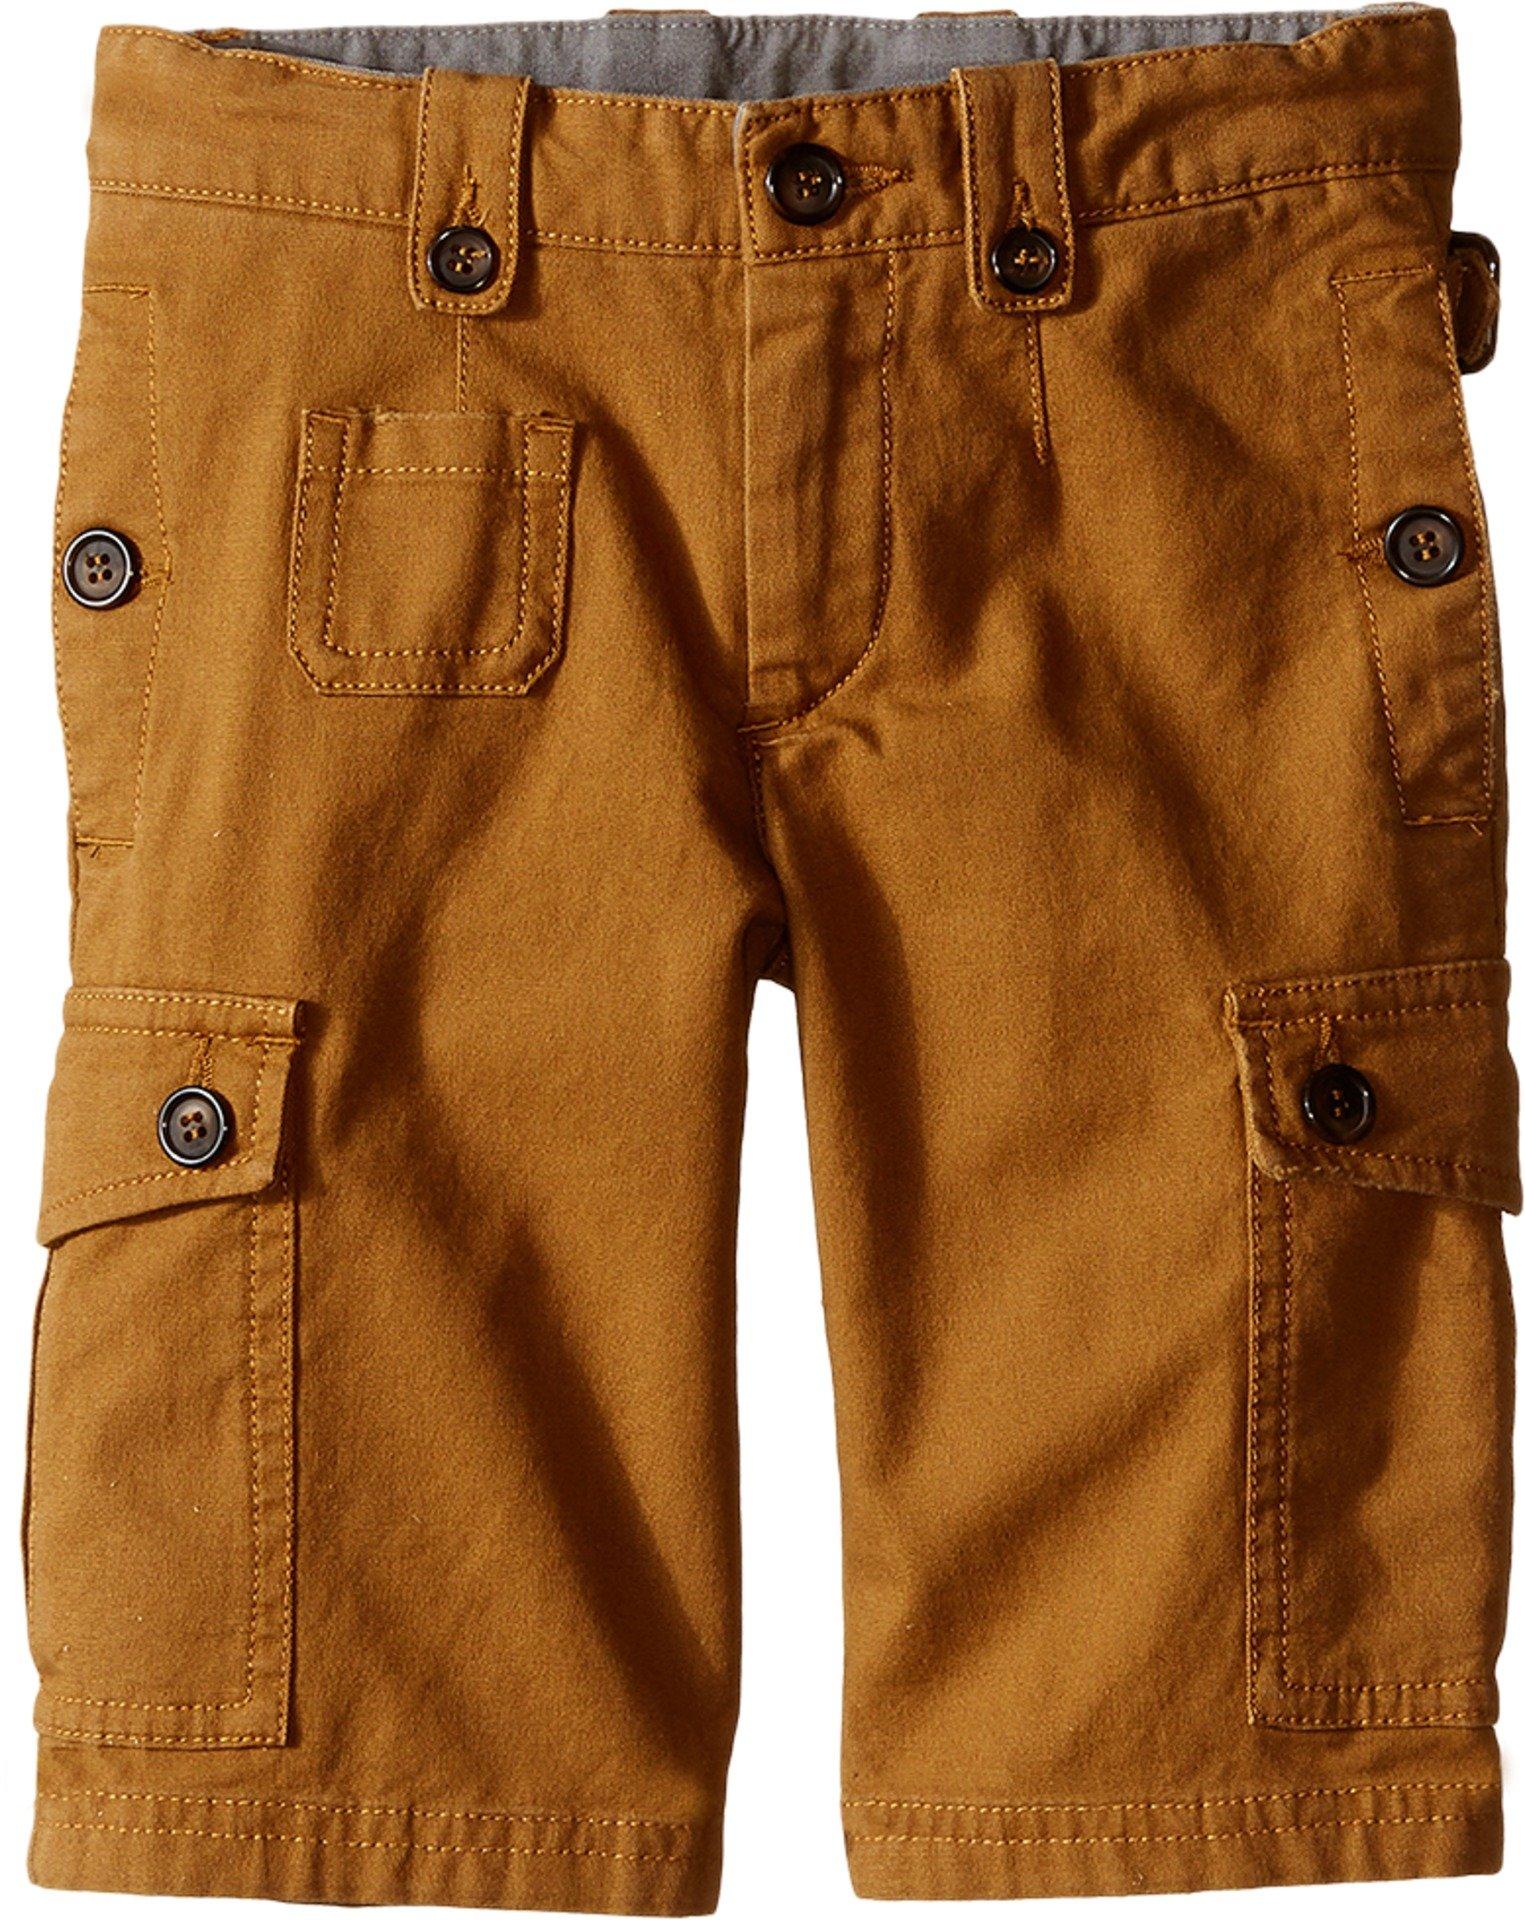 Dolce & Gabbana Kids Baby Boy's Cargo Shorts (Toddler/Little Kids) Rust Brown 5 (Little Kids) X One Size by Dolce & Gabbana